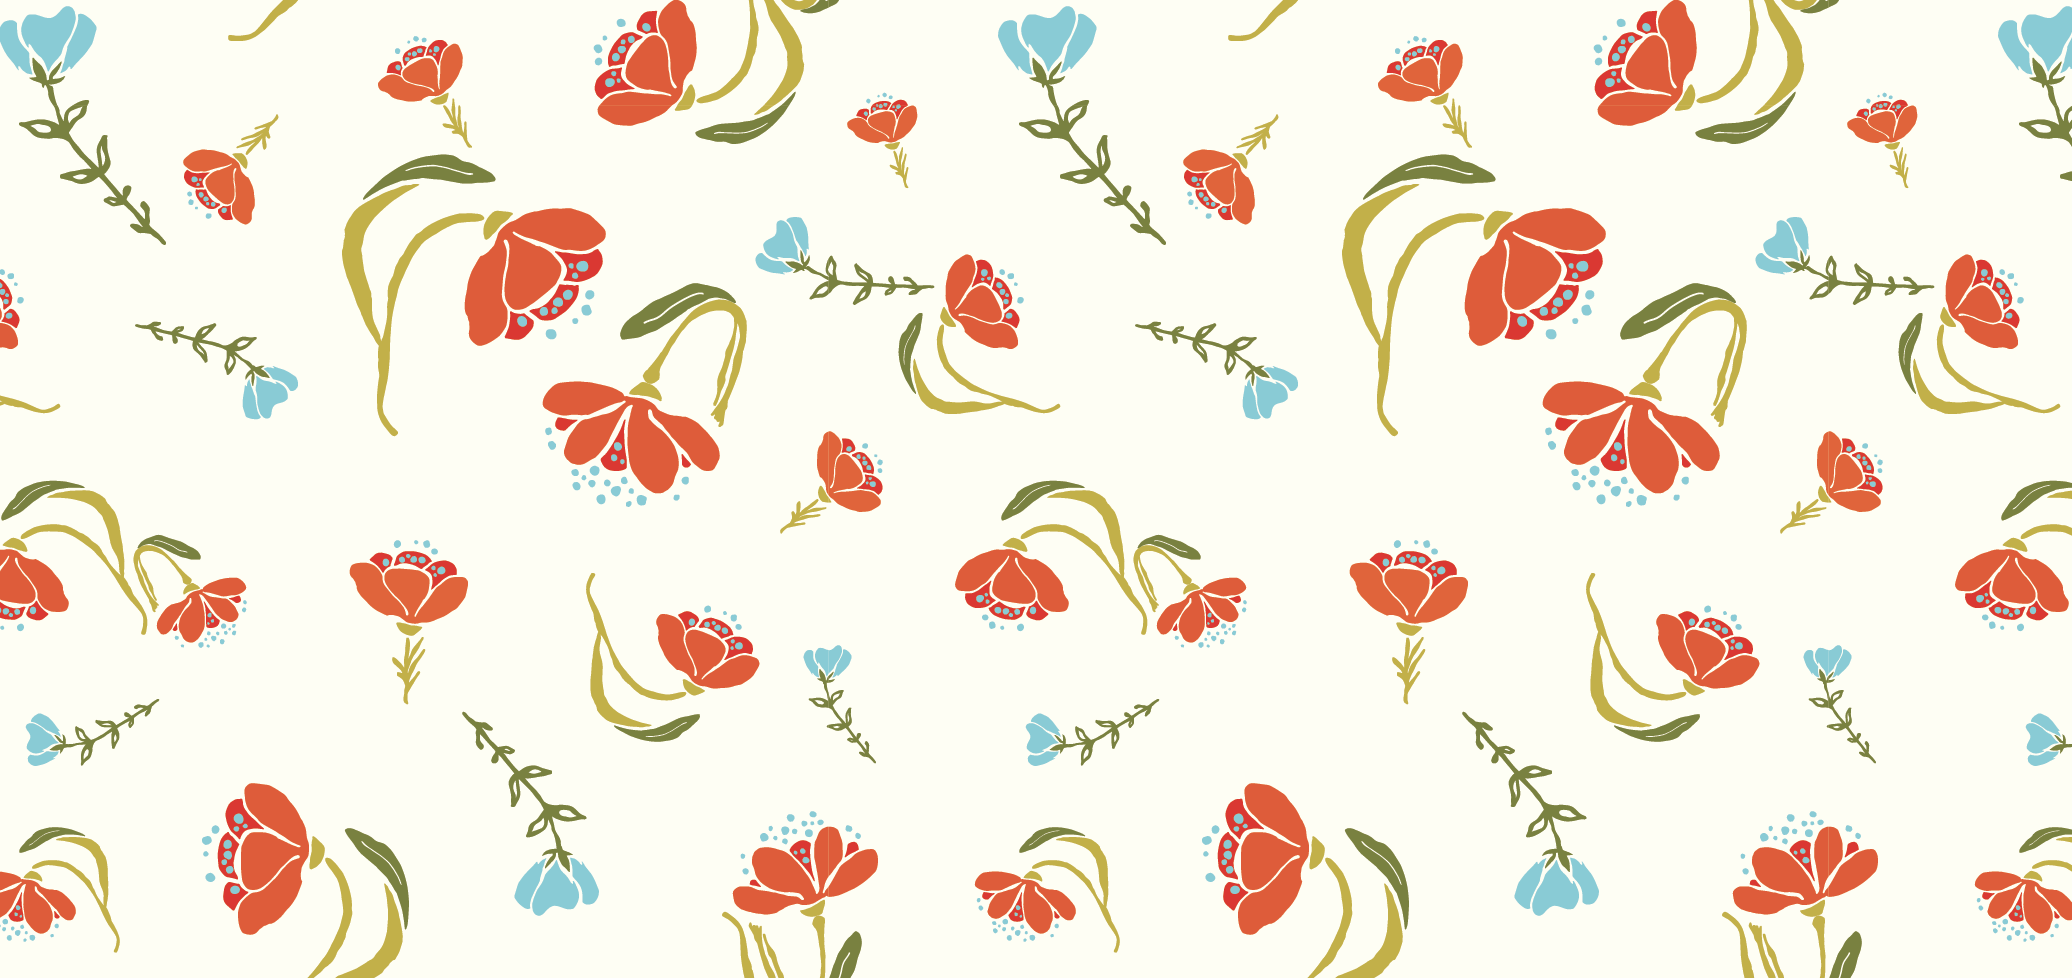 elena-wilken-walk-in-the-countryside-surface-pattern-design3.png